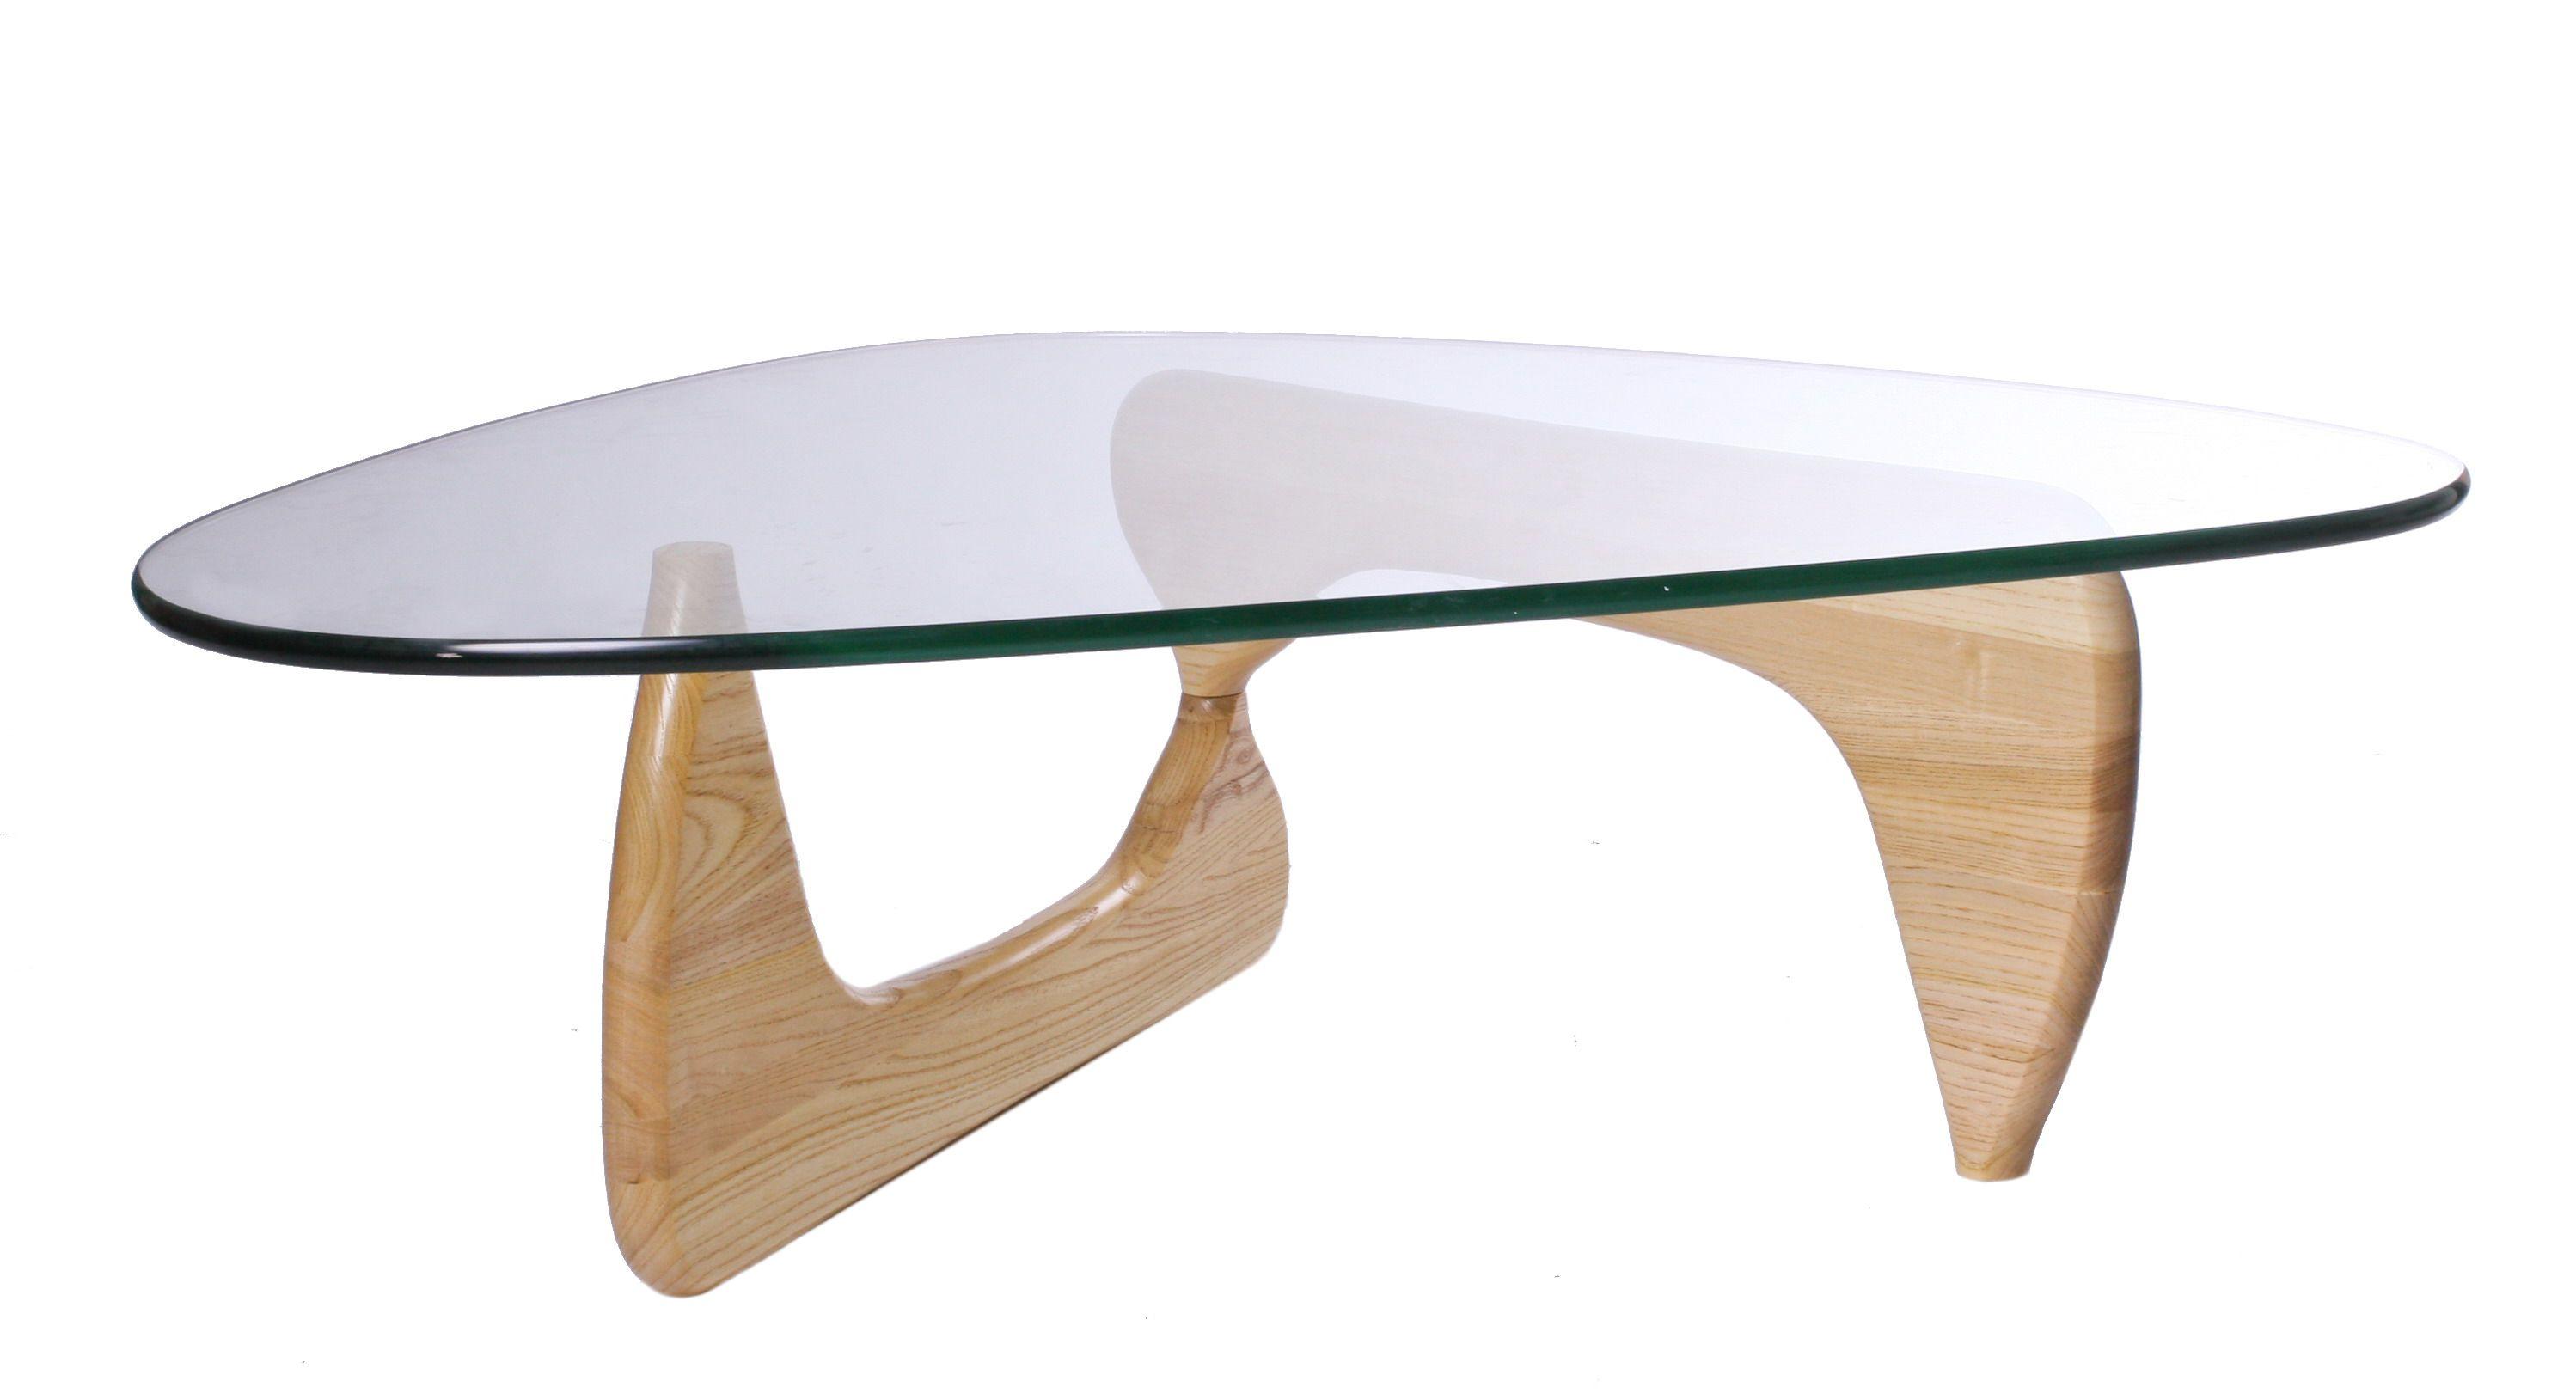 Noguchi Coffee Table By Isamu Noguchi Noguchi Coffee Table